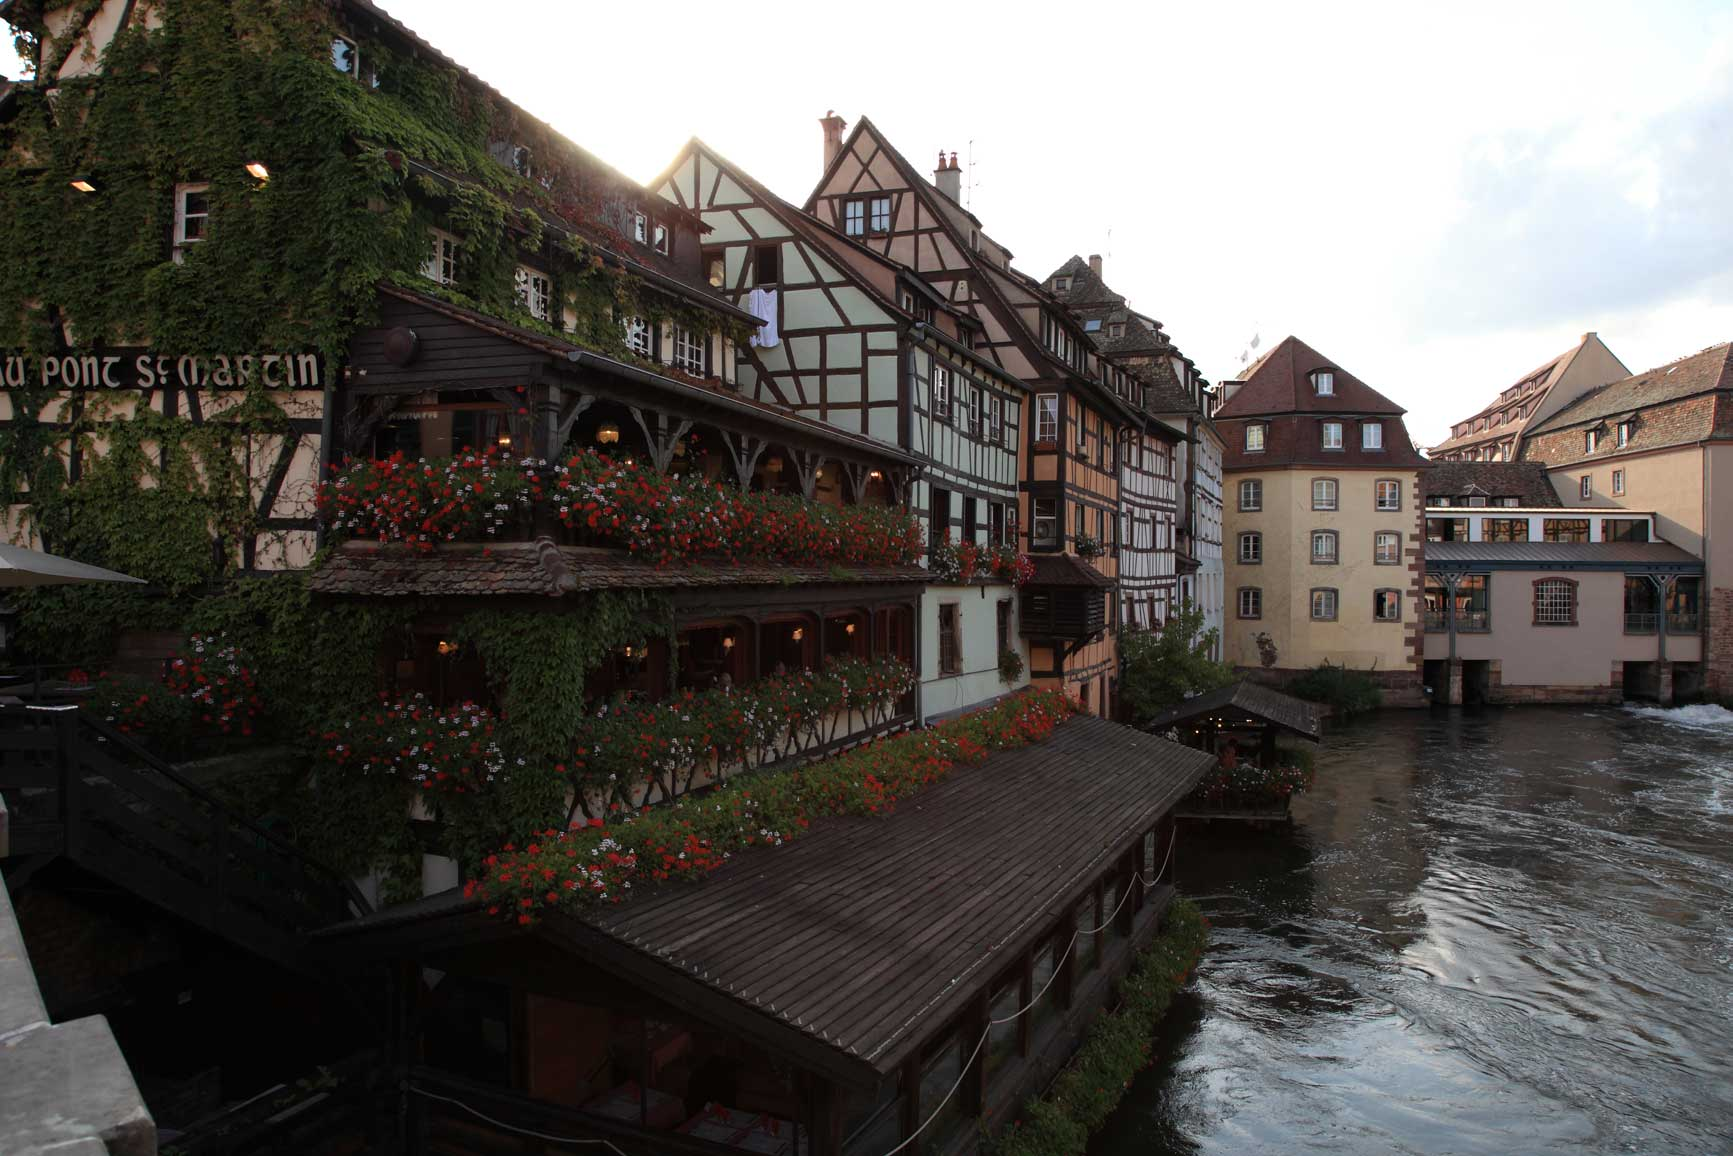 Rhine-11-08-14_20-50-55